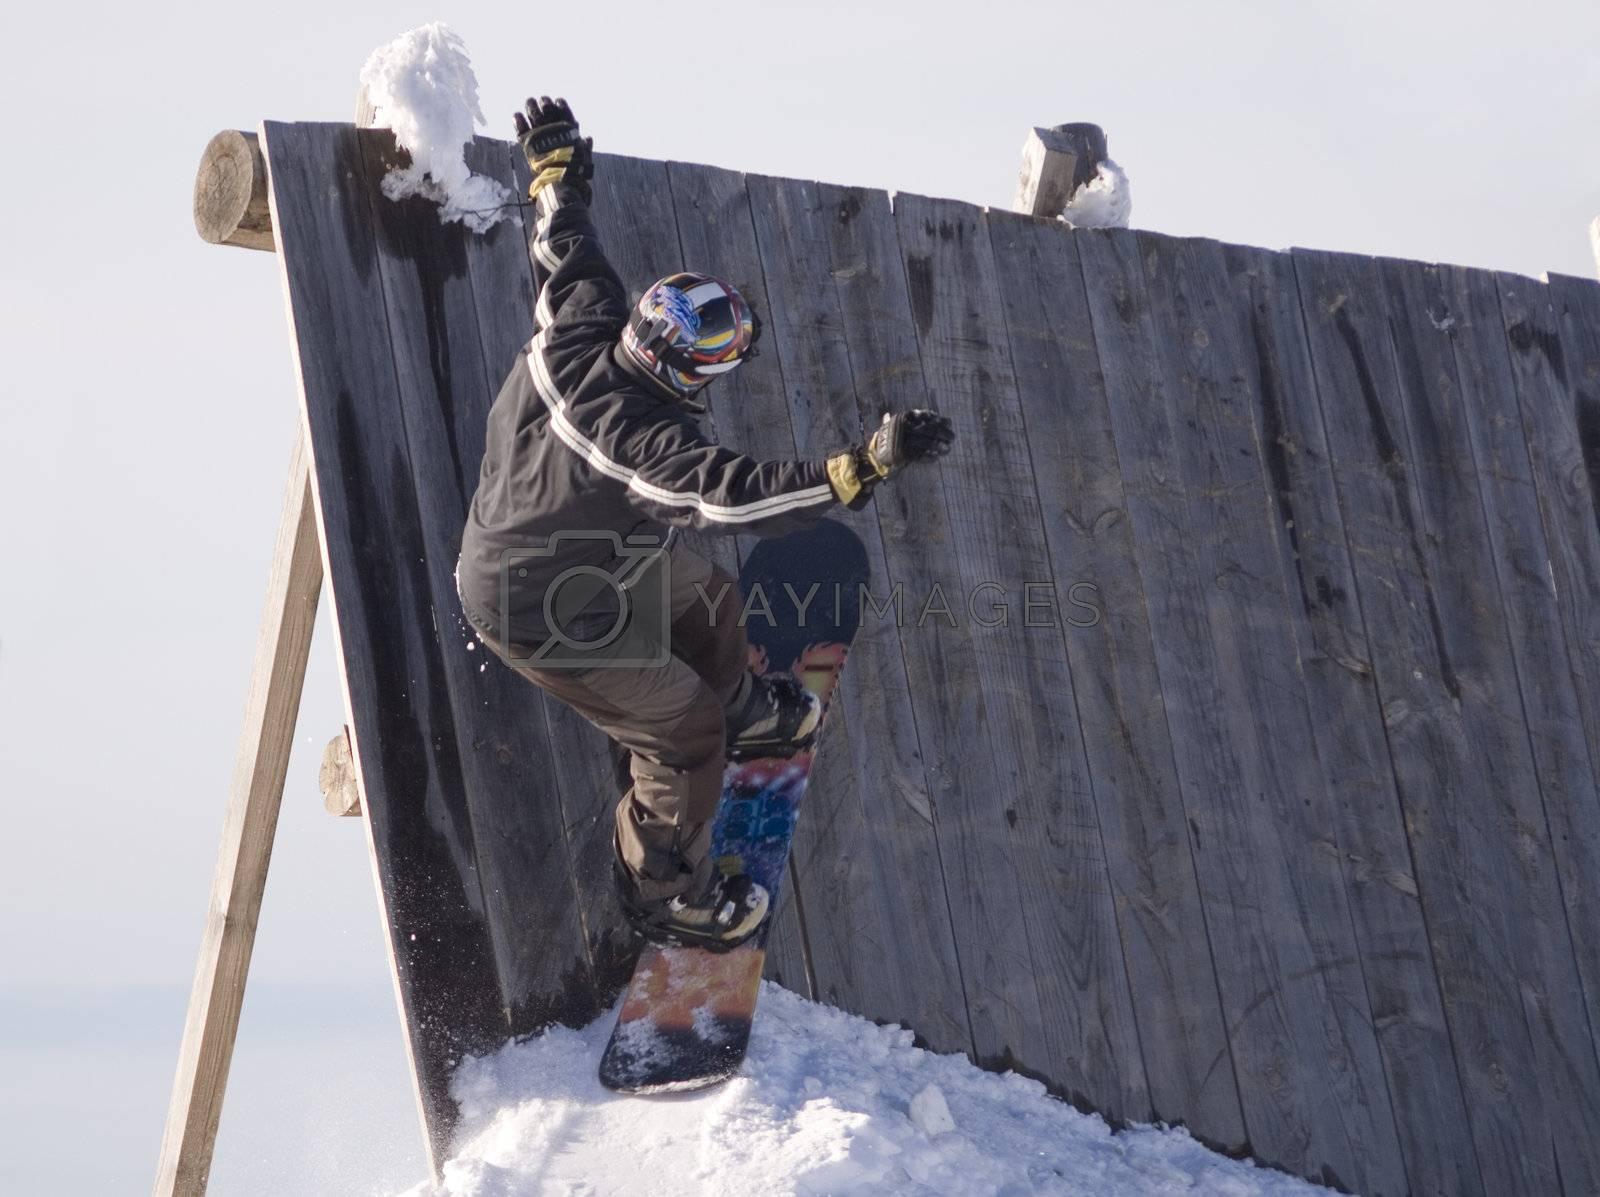 Snowboard Jump by PauloResende